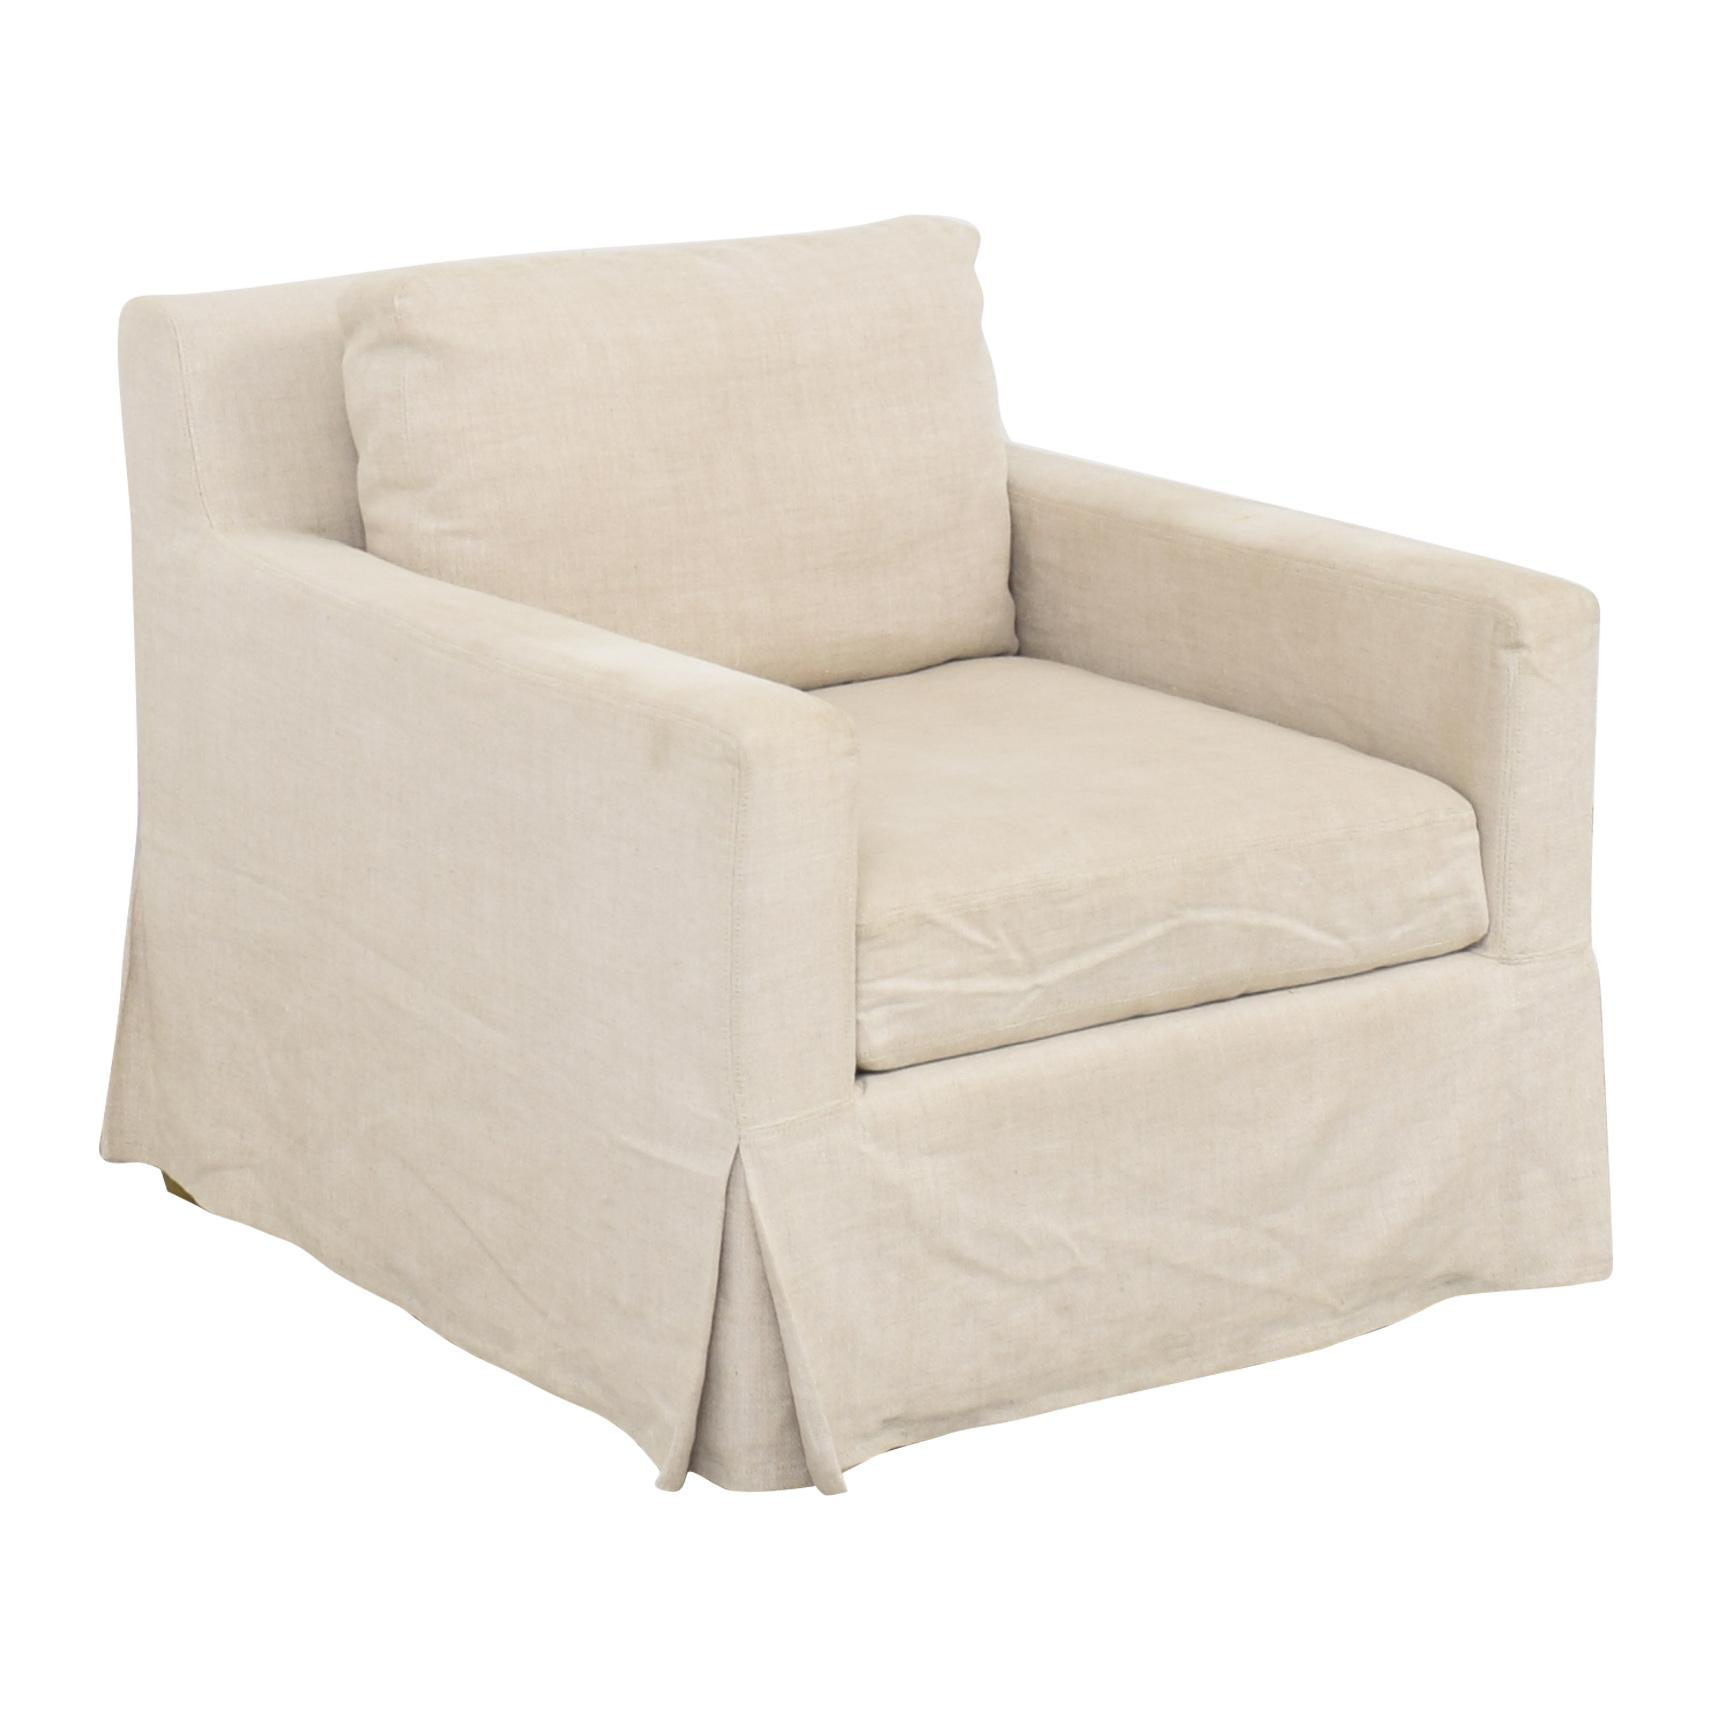 buy Restoration Hardware Belgian Linen Track Arm Slipcovered Chair Restoration Hardware Chairs